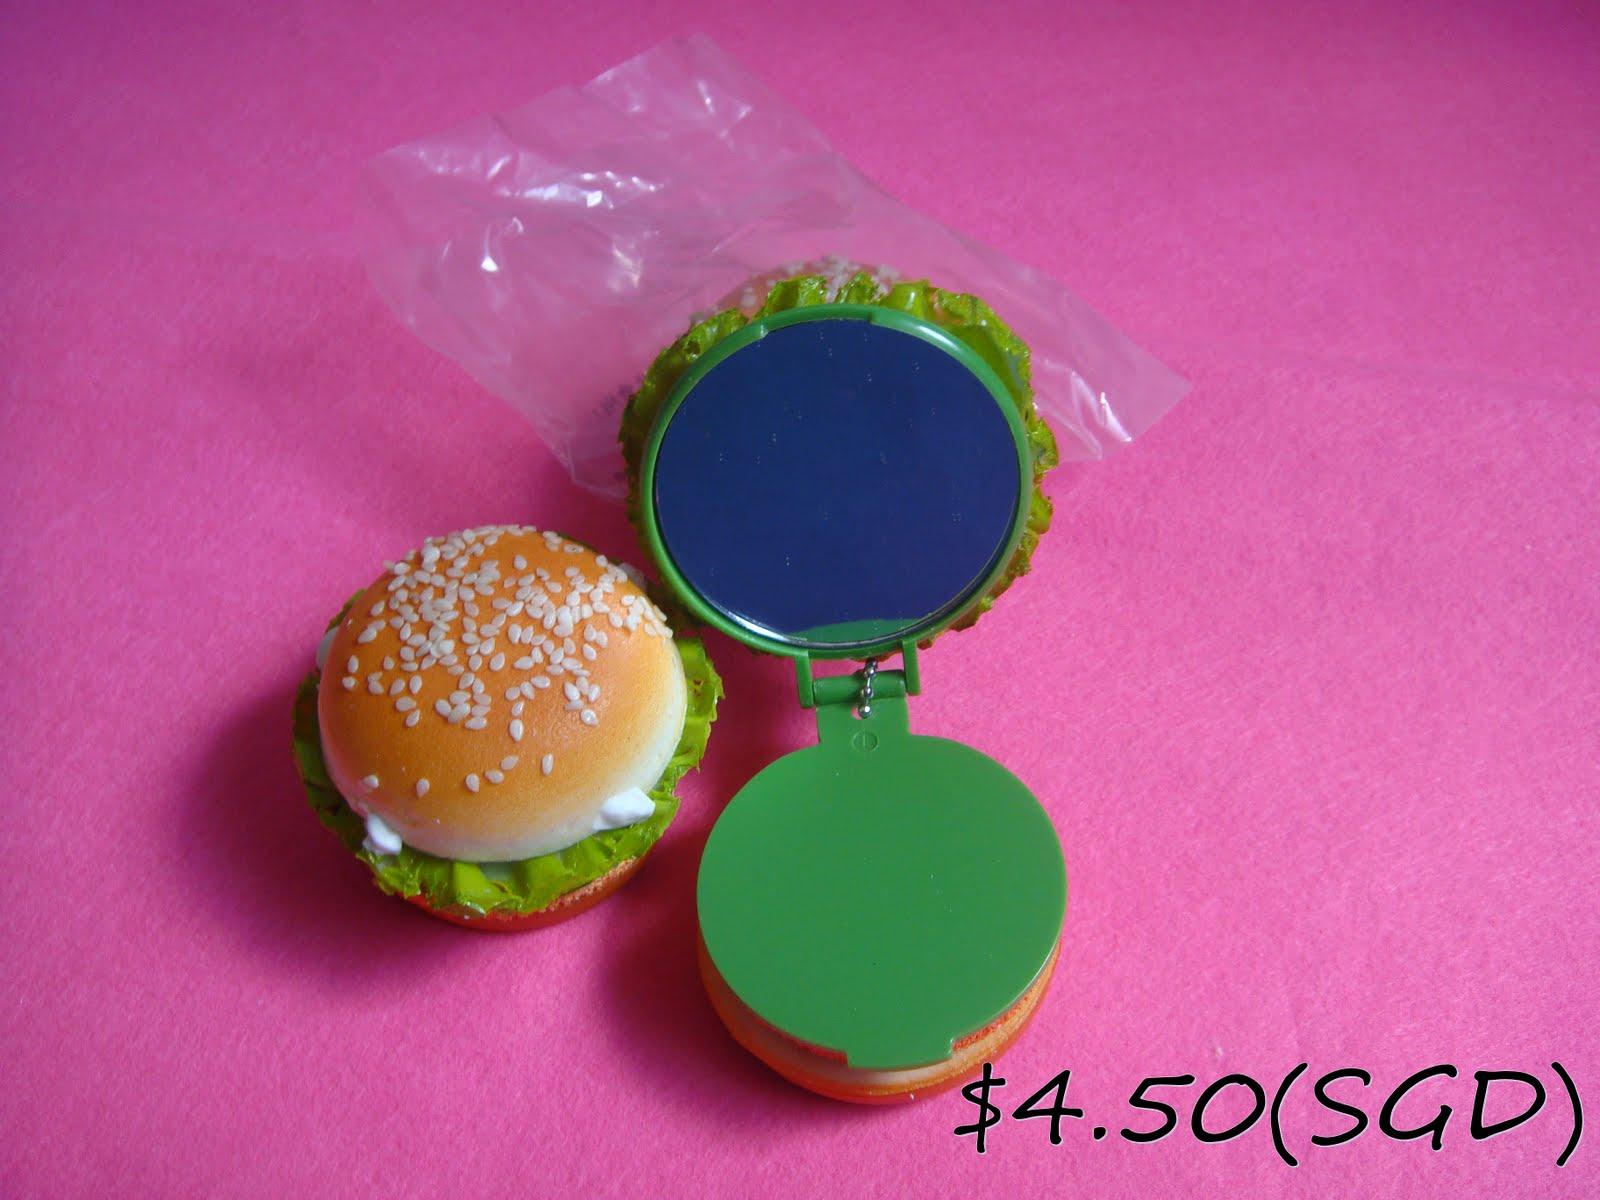 Squishy Burger Mirror : PINK Little Store: Squishy